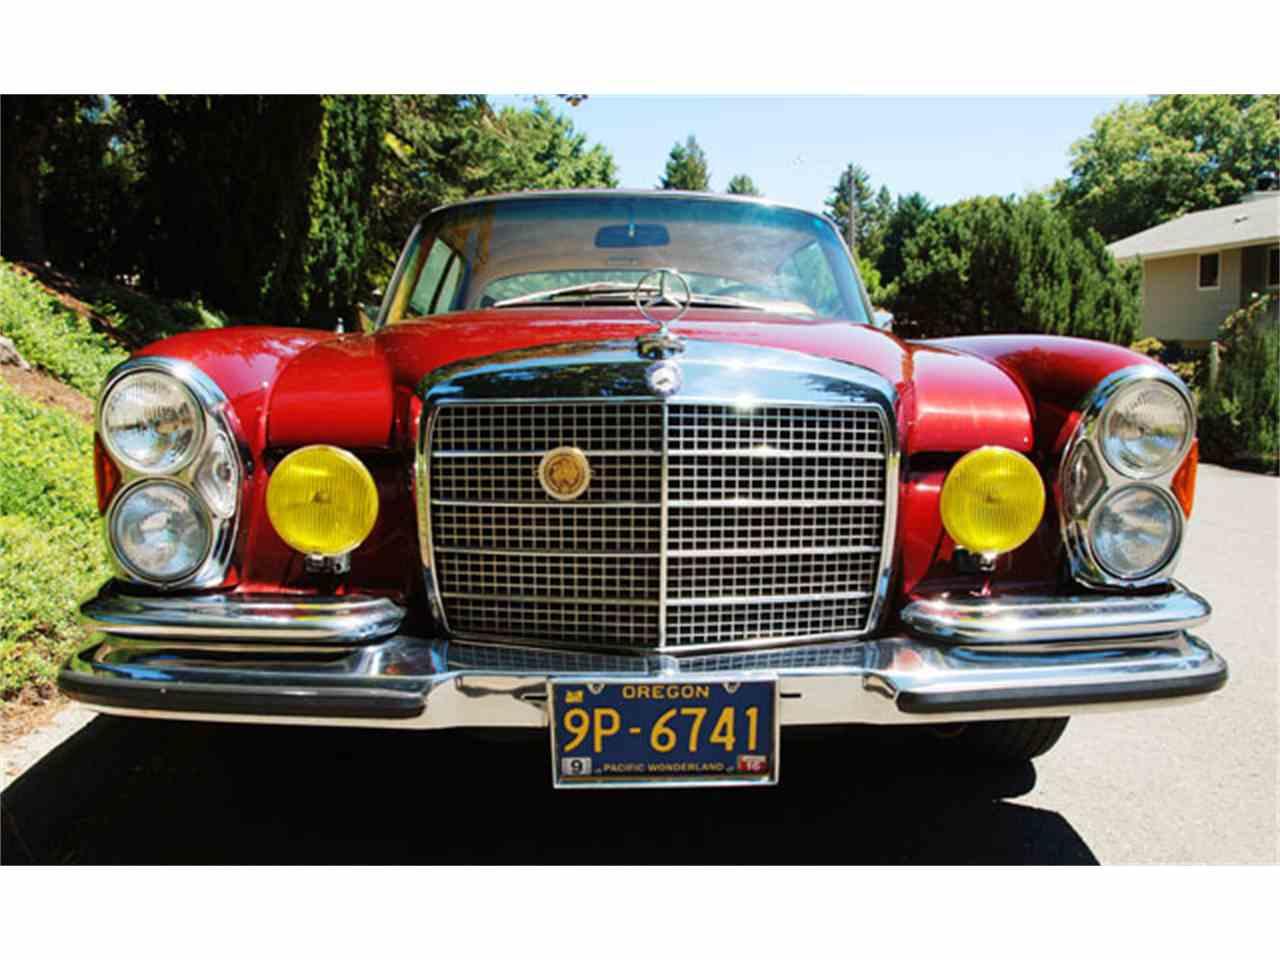 1971 Mercedes Benz 280se For Sale Classiccars Com Cc